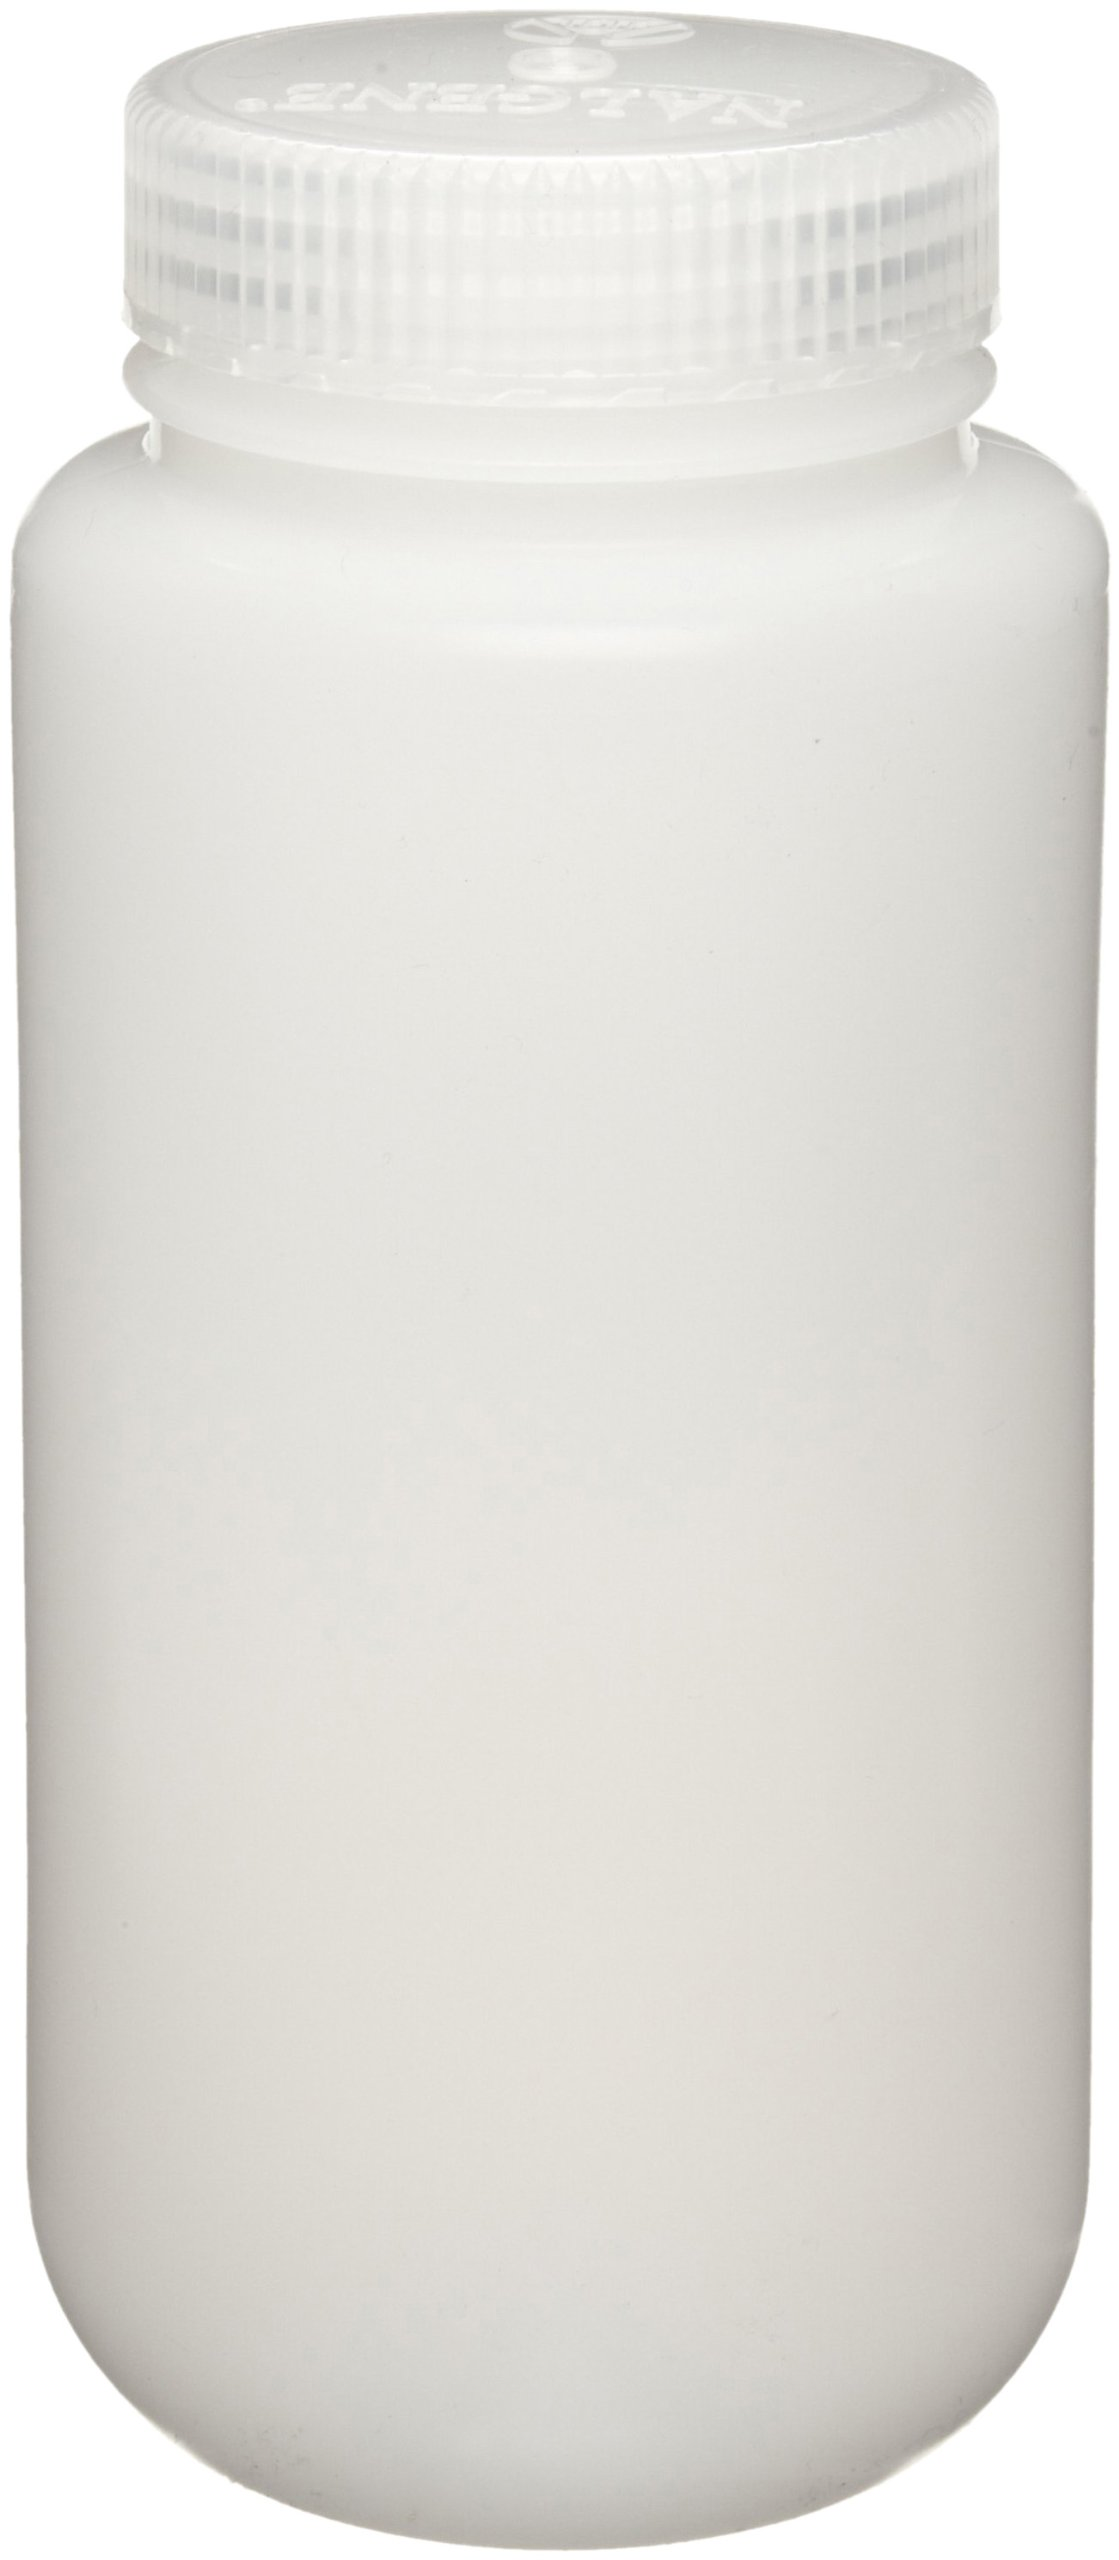 Nalgene 2199-0016 PassPort IP2 Bottle, Hazmat Shipper, Wide-Mouth, HDPE, 500mL (Pack of 12)